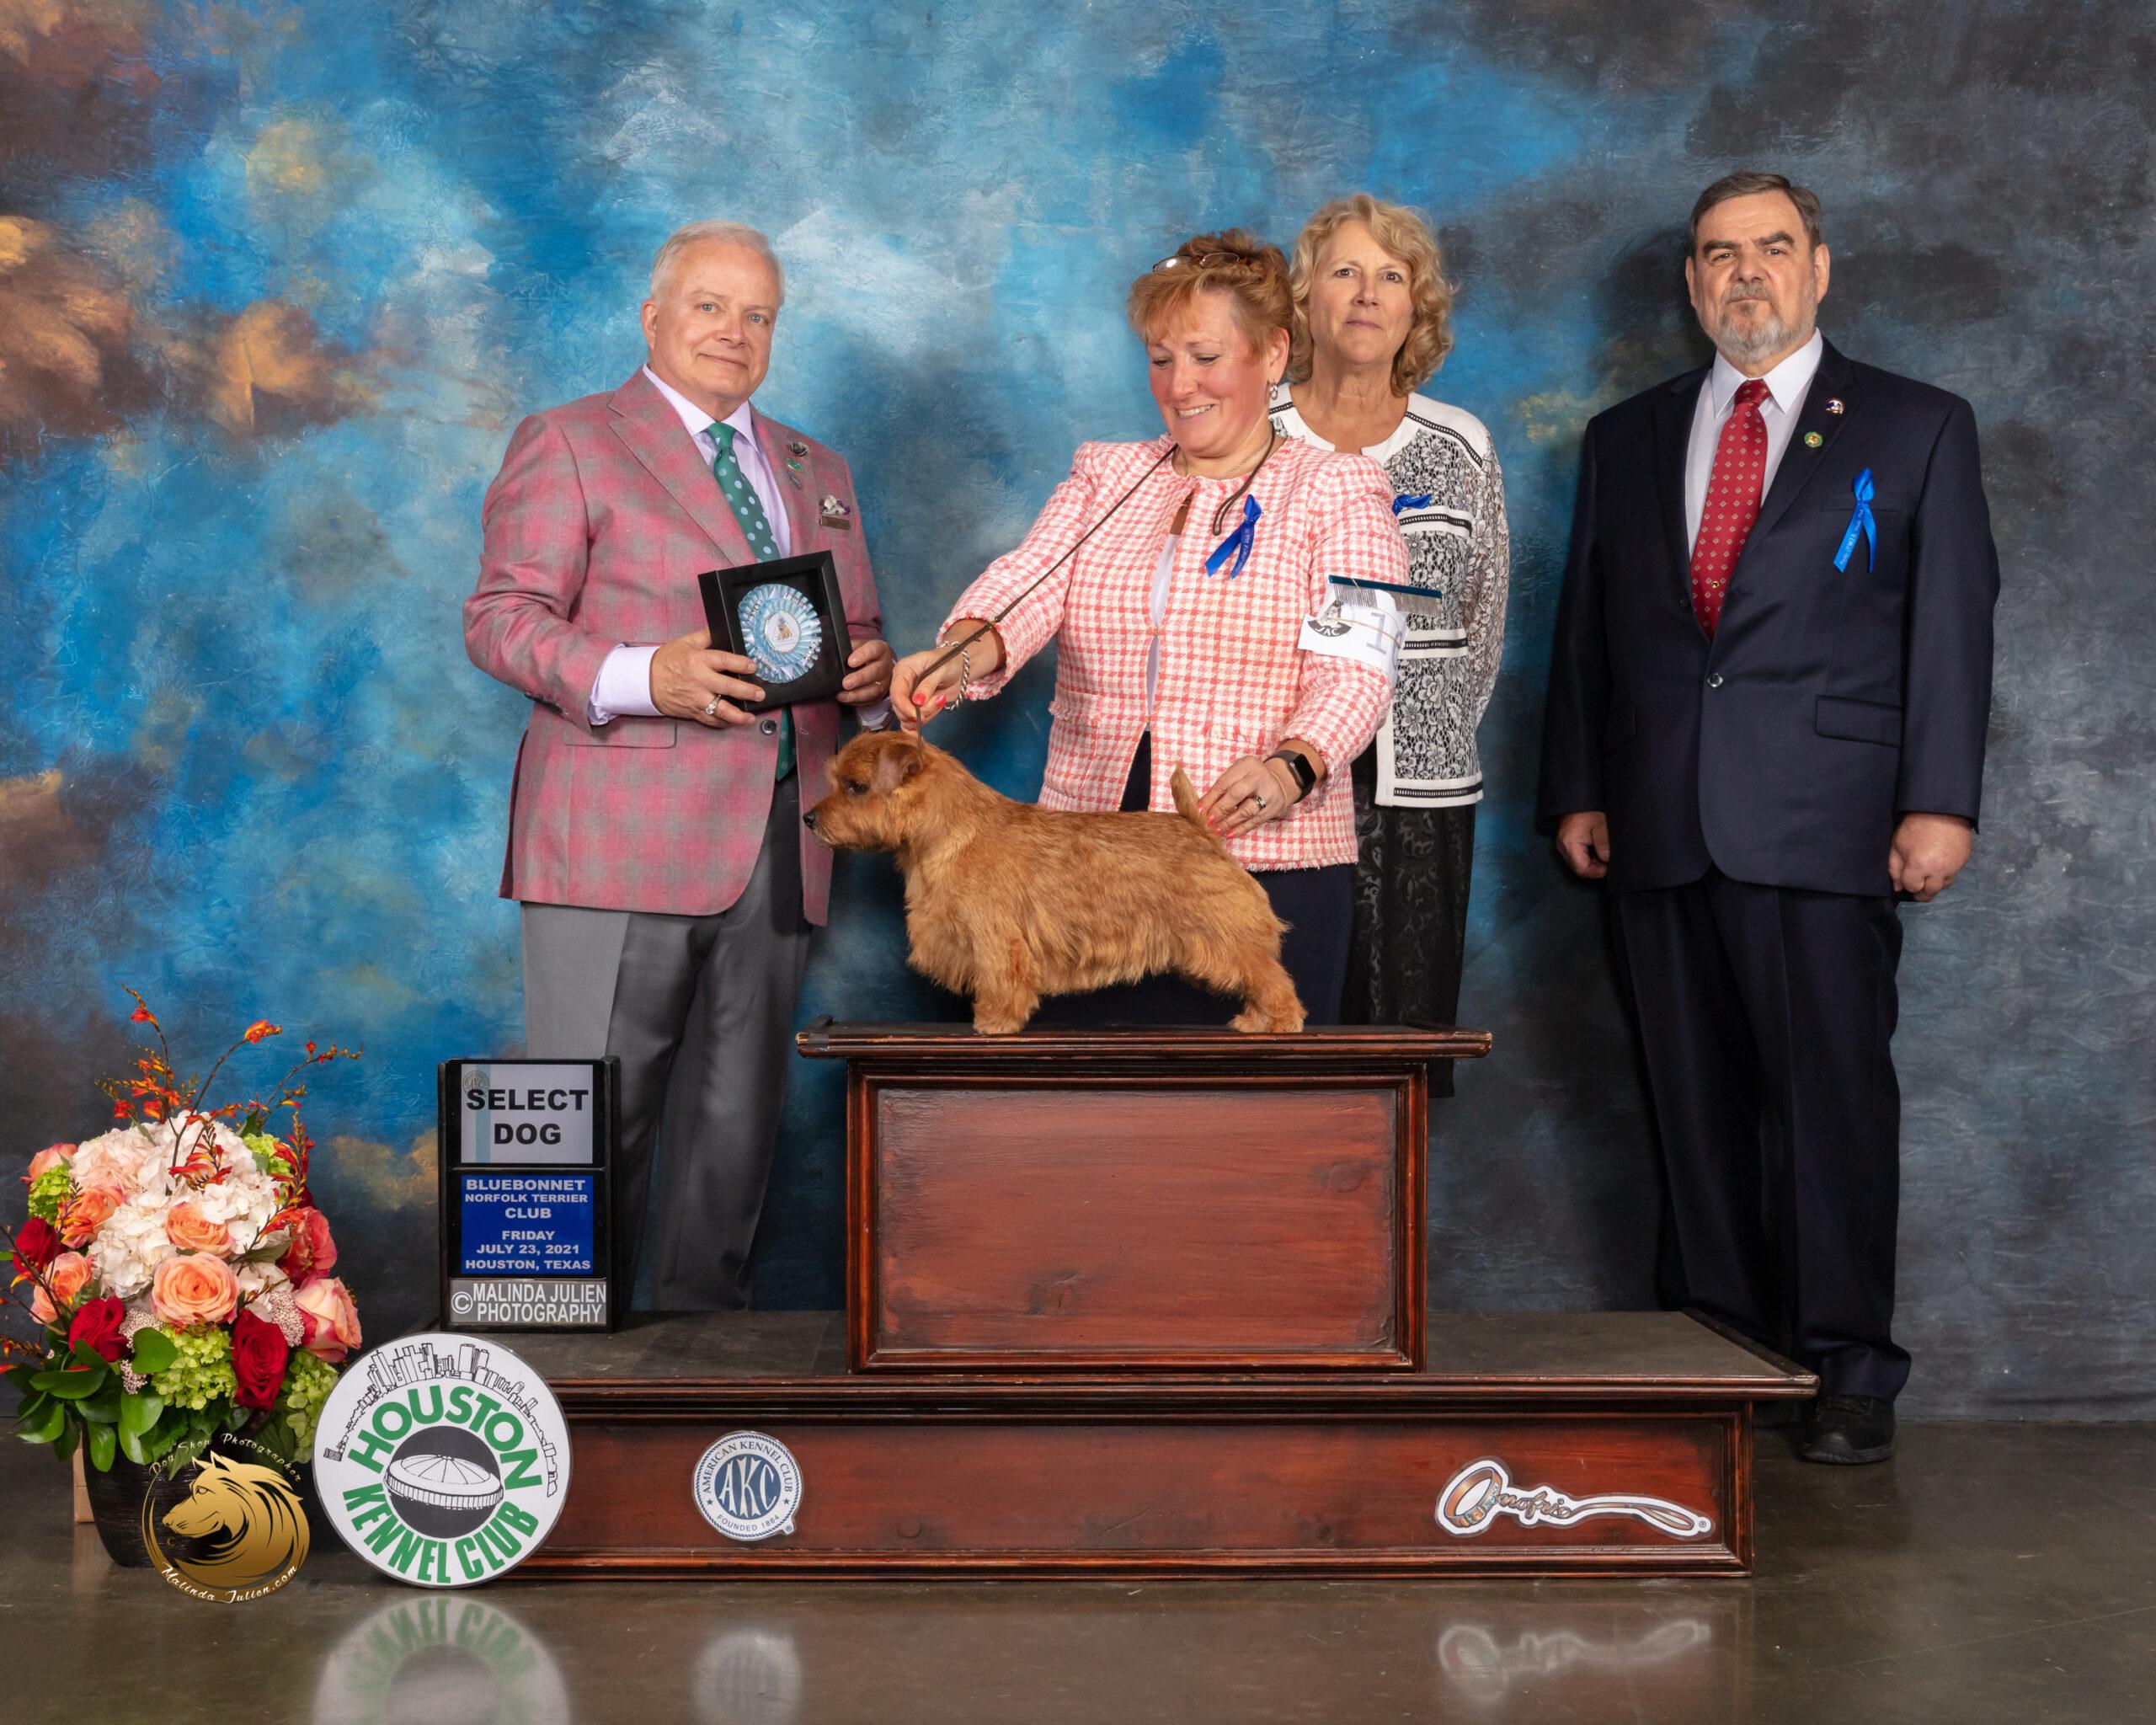 Norfolk_Terrier_#9_Fri_SD_Judge_Dennis_Mccoy-MMJ_0647-HOUSTON21-HR3-(ZF-10718-03024-2-001)